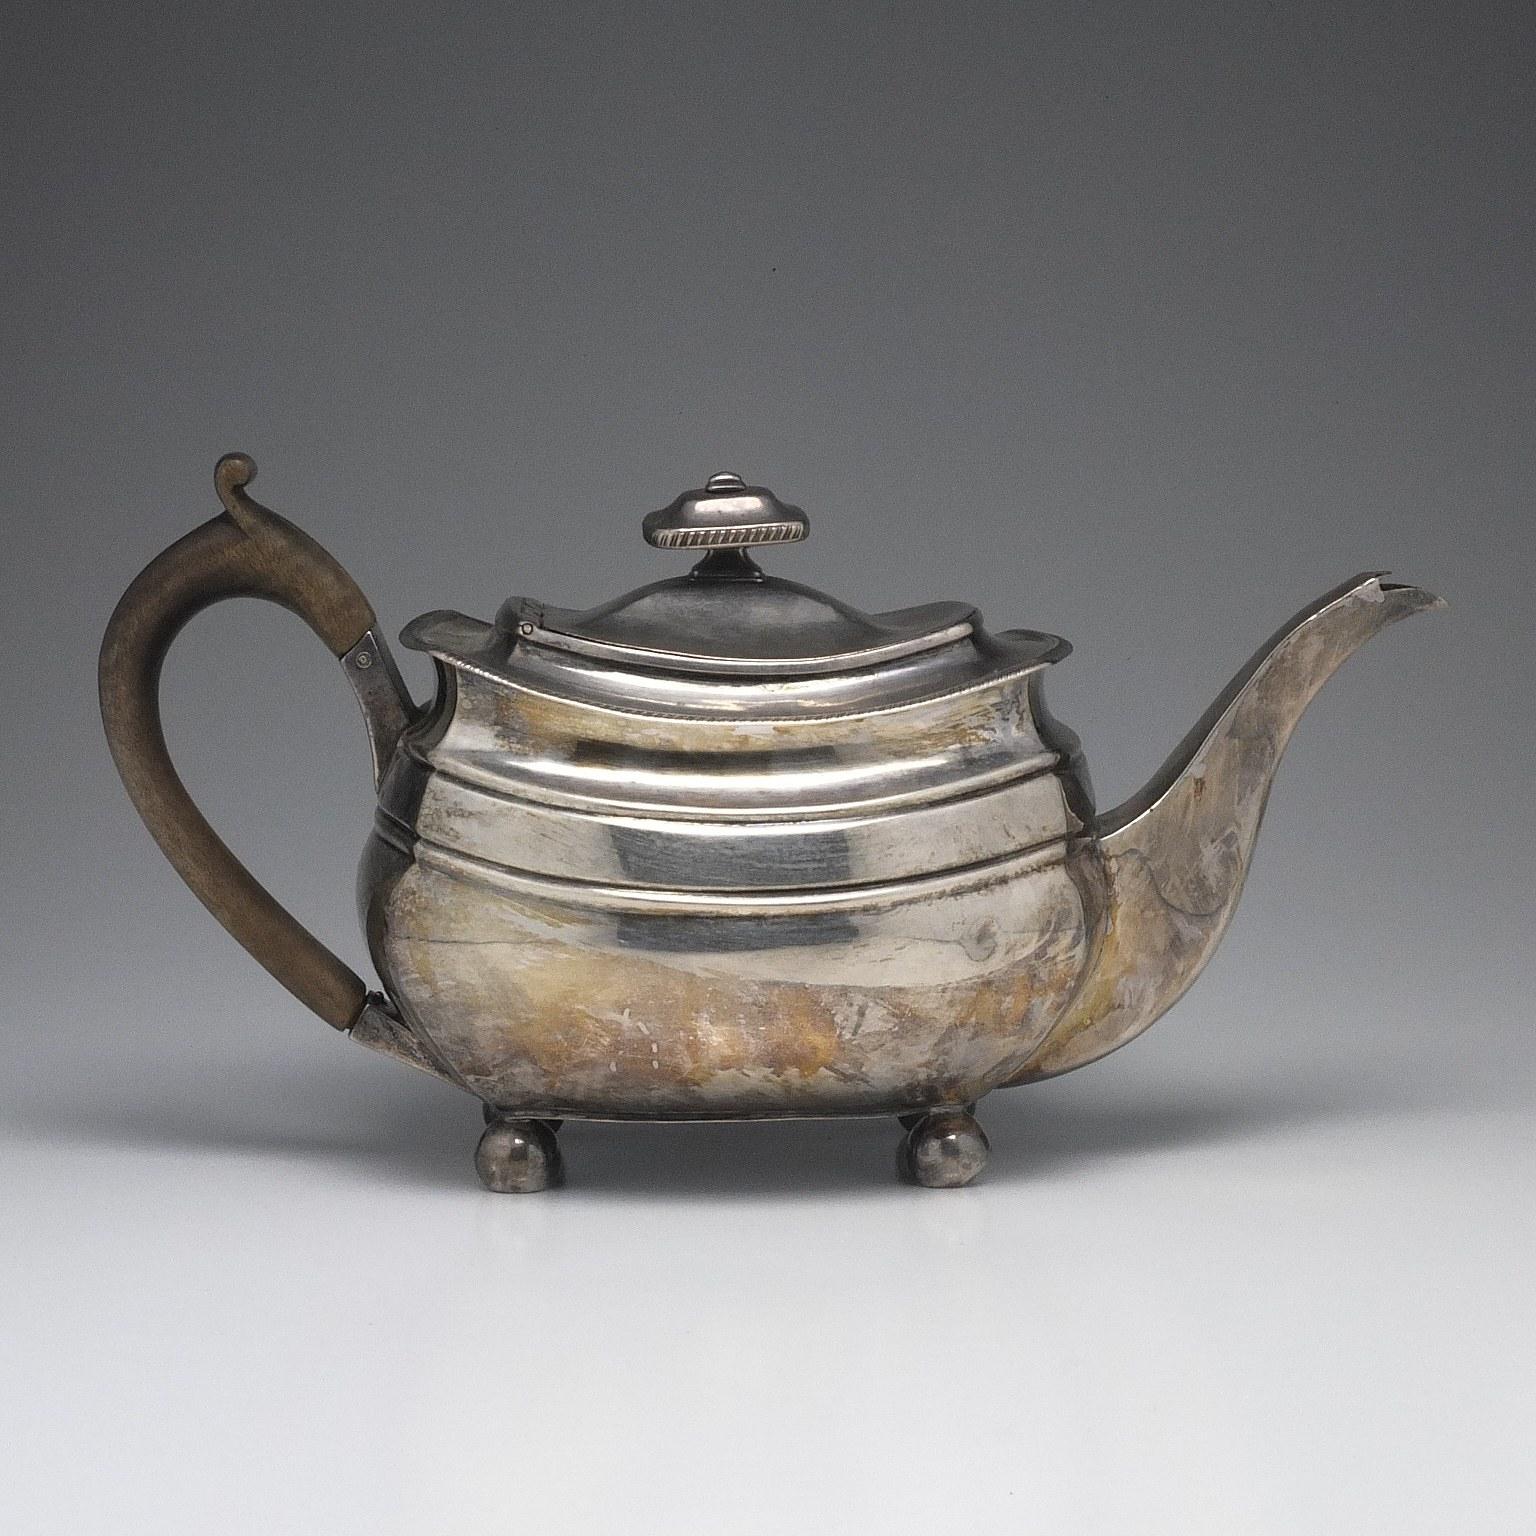 'George III Sterling Silver Teapot Solomon Hougham London 1808'